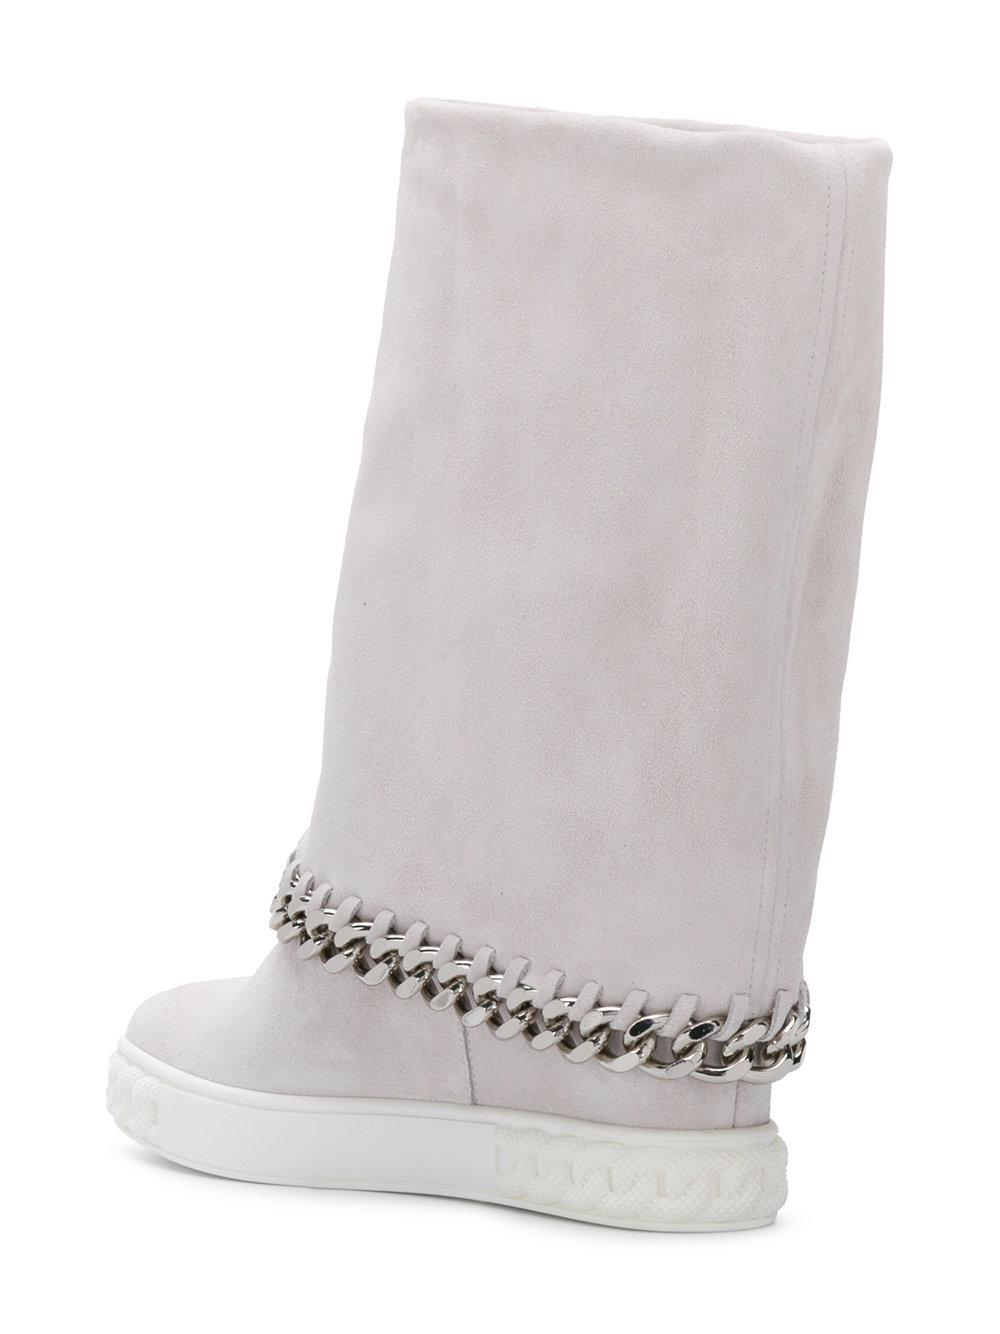 Casadei Chaucer chain embellished boots S5qsMOn5D